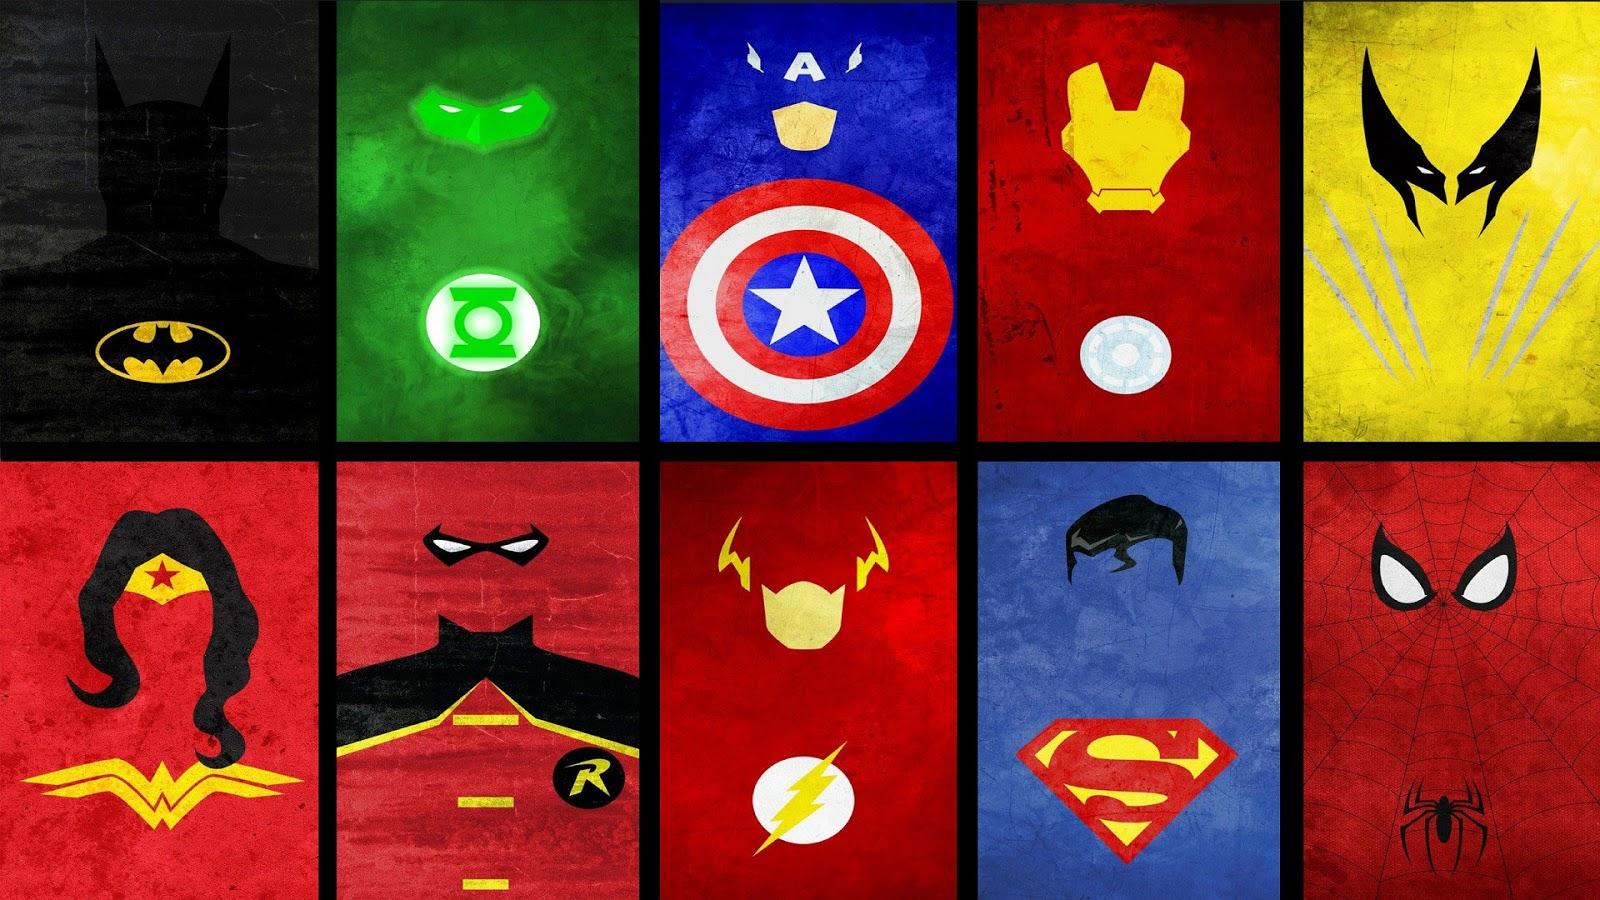 Superheroes Logos Wallpaper Ive No Clue Where This 1600x900